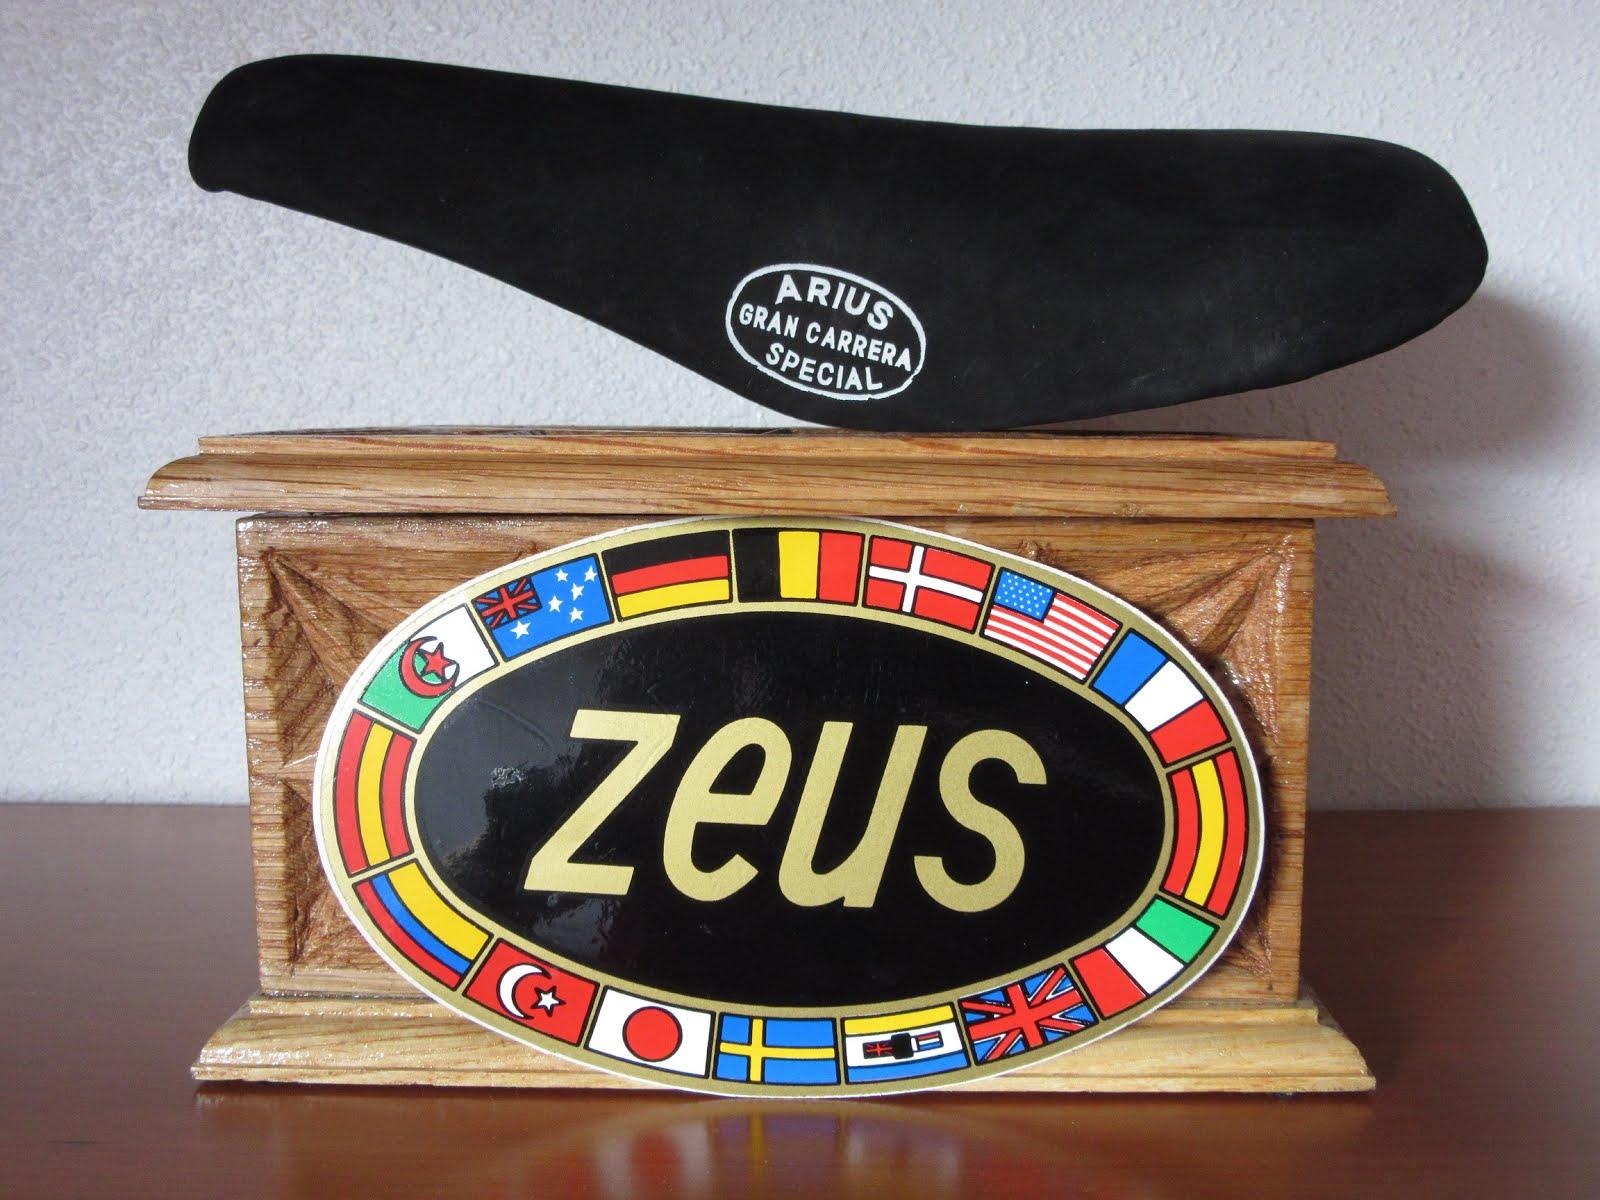 Sillin - Arius Special Gran Carrera